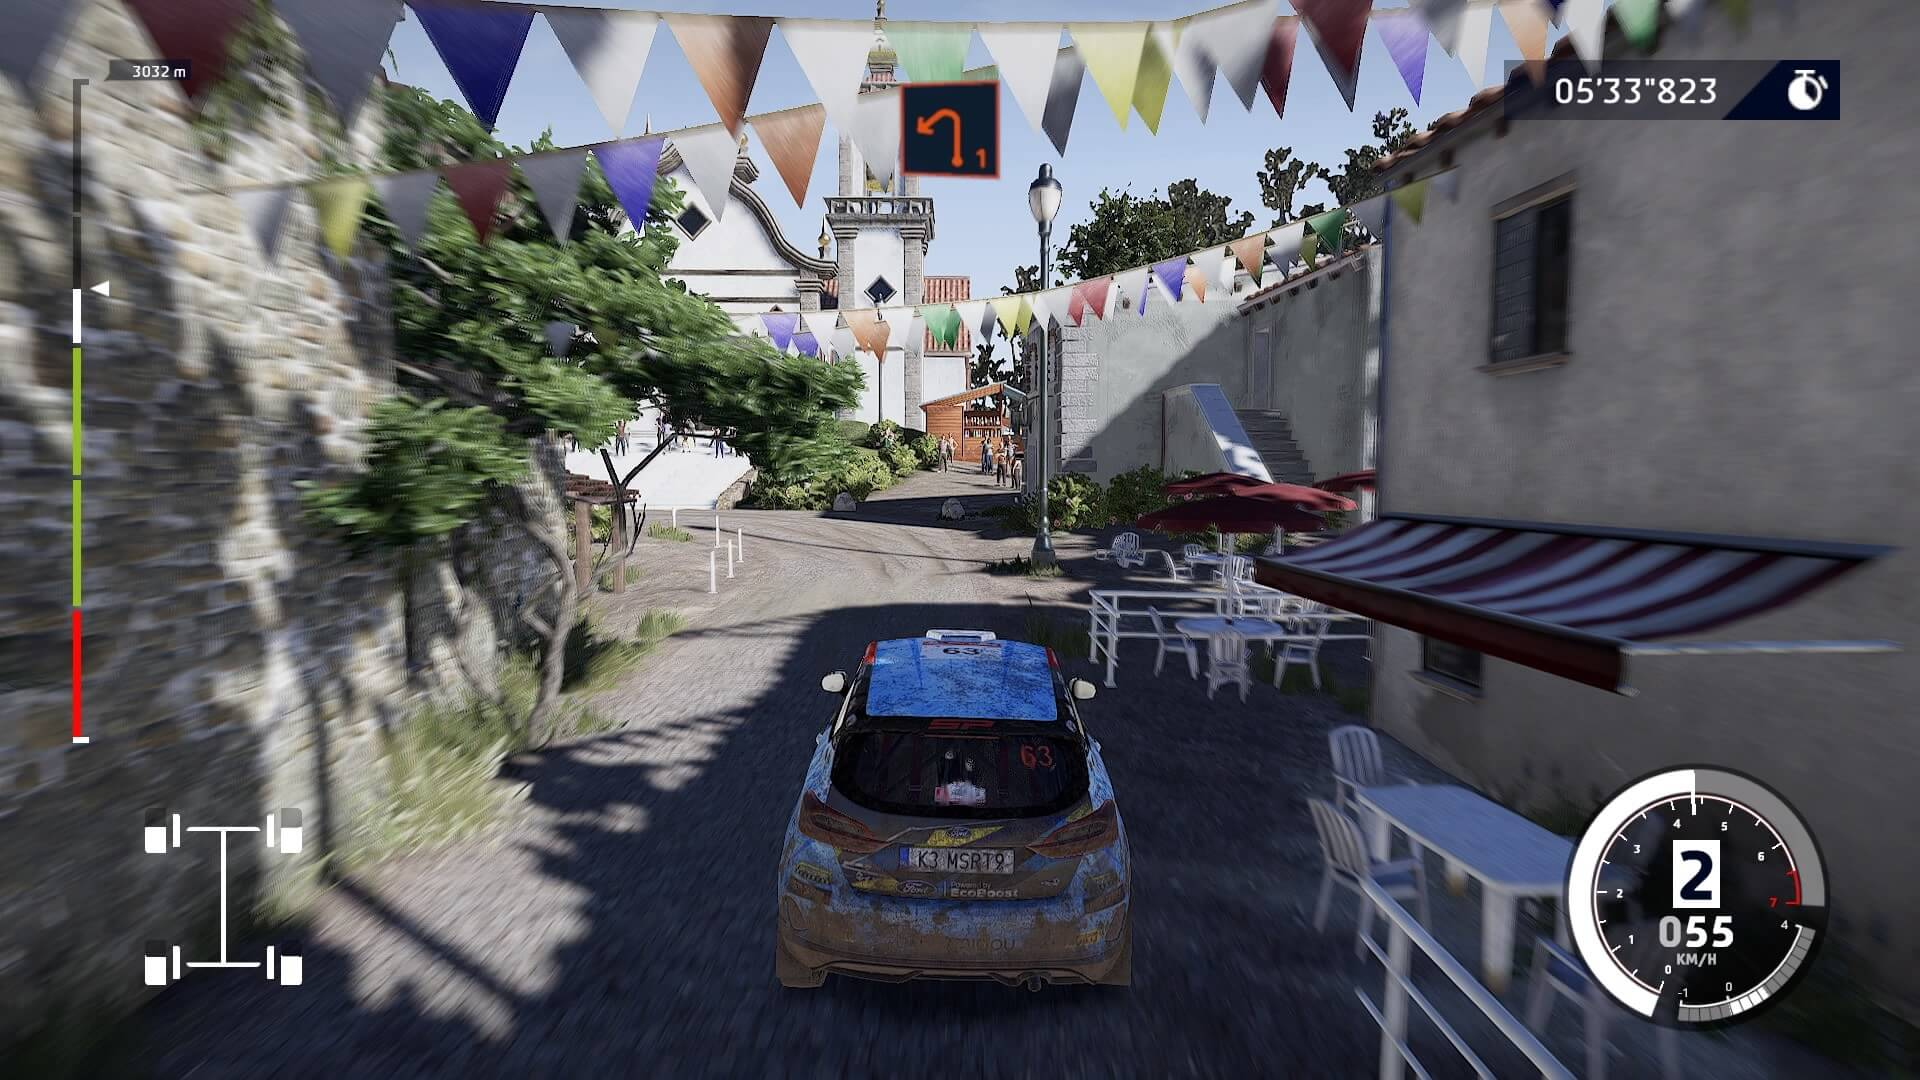 wrc 10 fia world rally championship 20210912191333